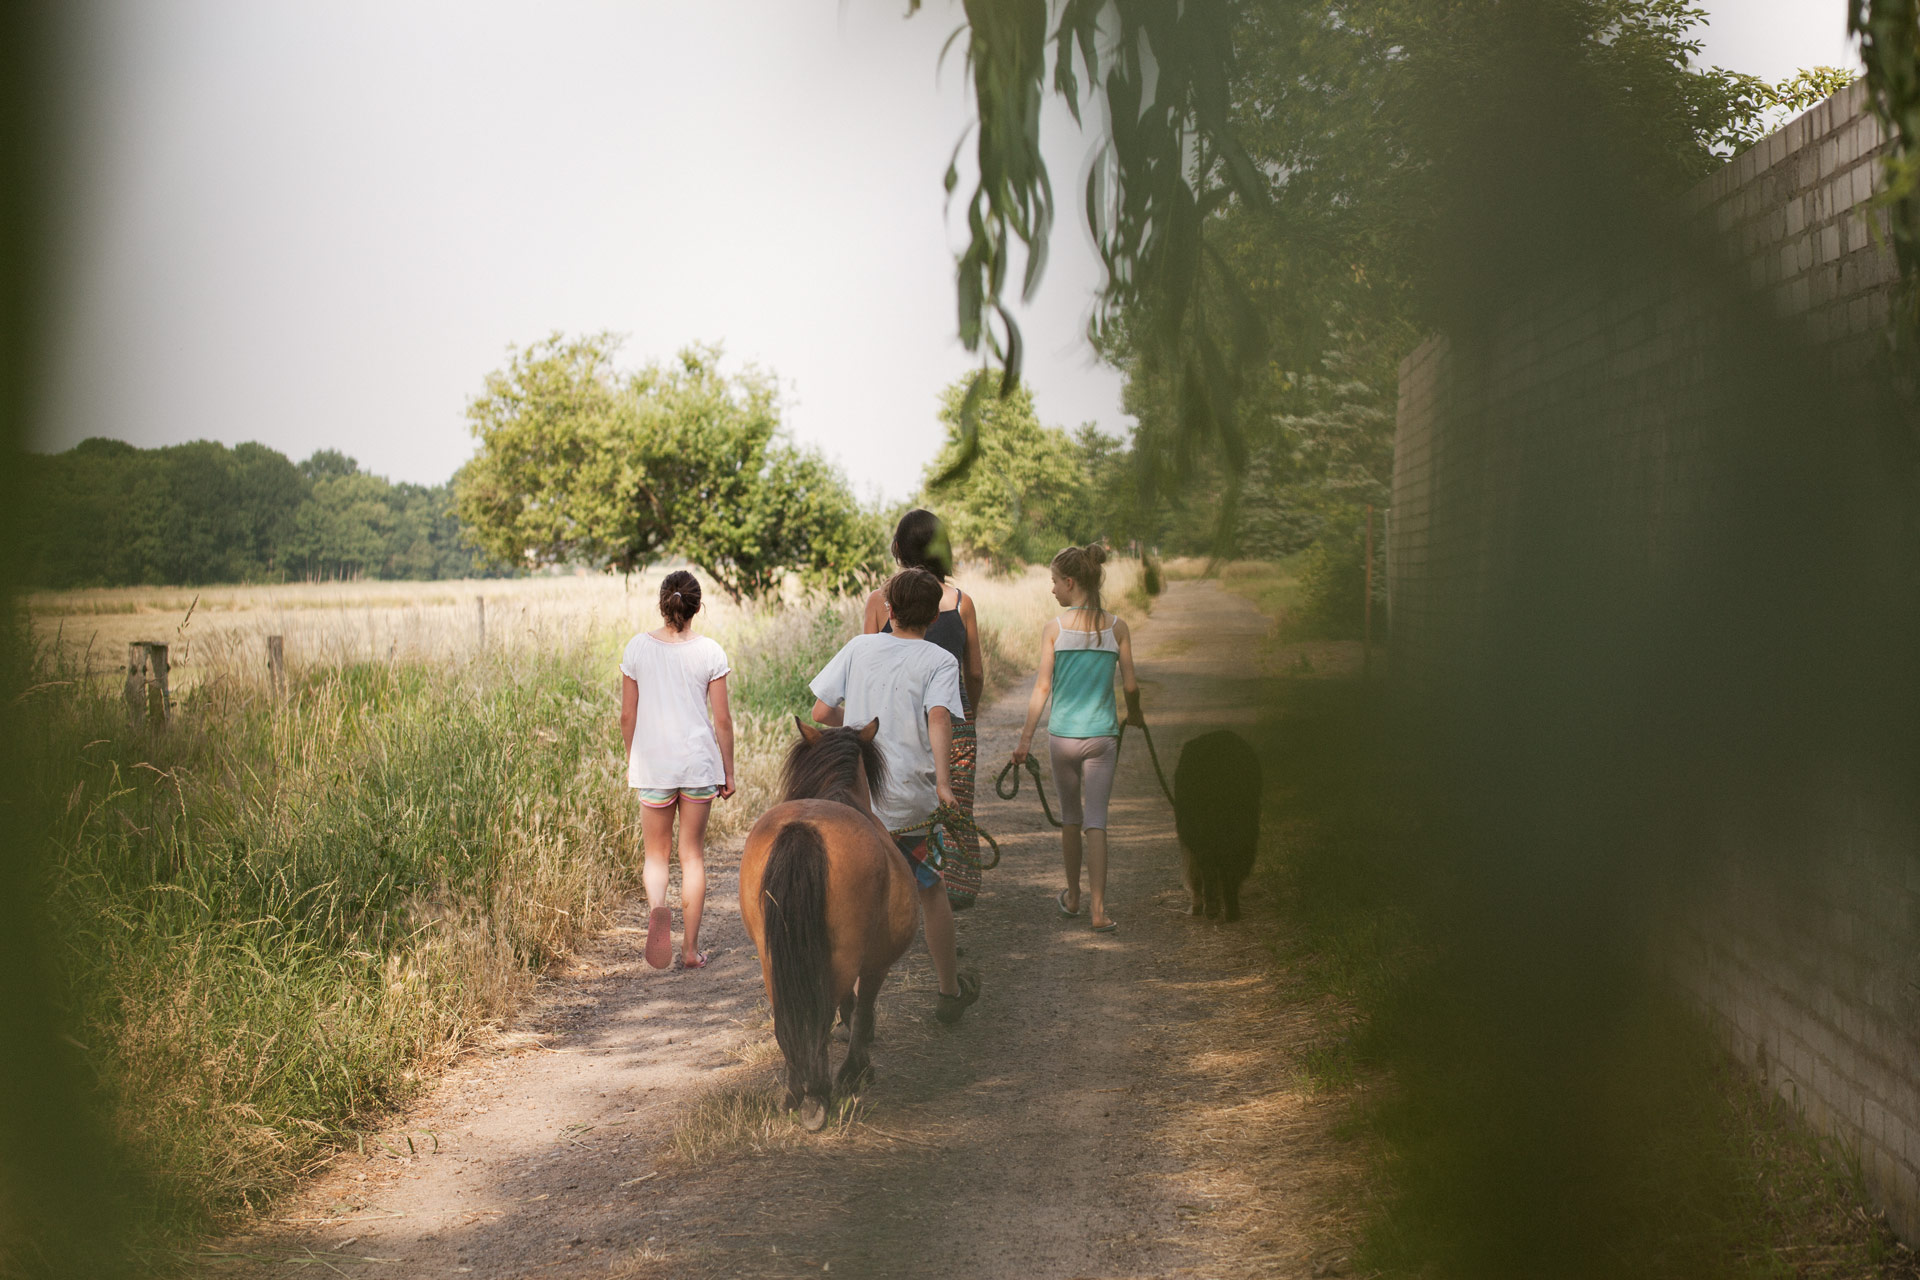 timo-stammberger-photography-fotografie-harmony-nature-animals-summer-mitgefuehl-vegan-compassion